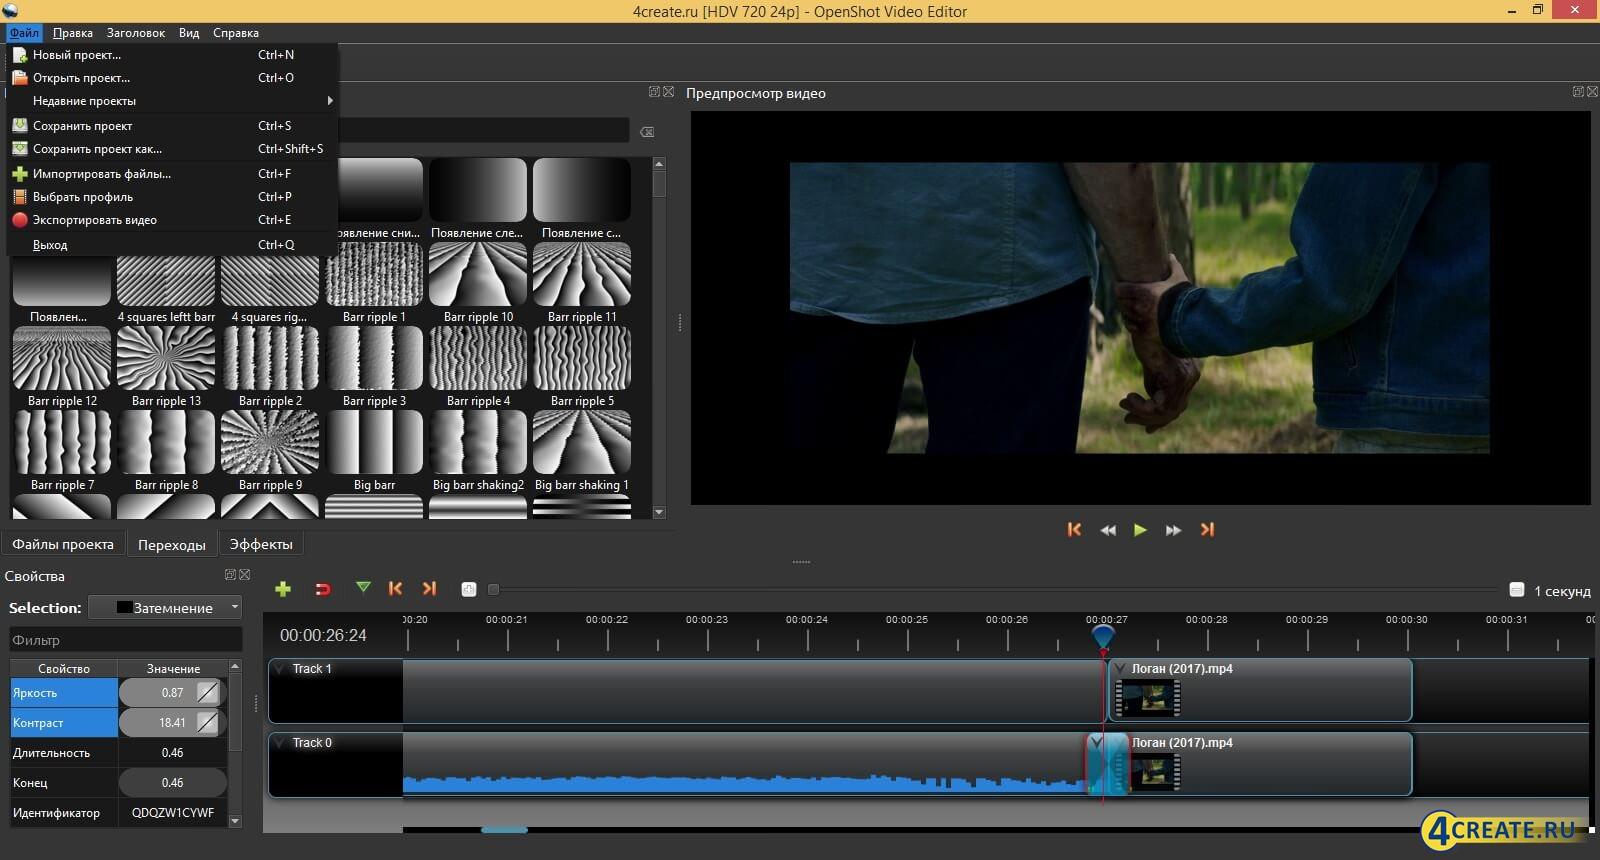 OpenShot Video Editor 2.2 (Скриншот 4)